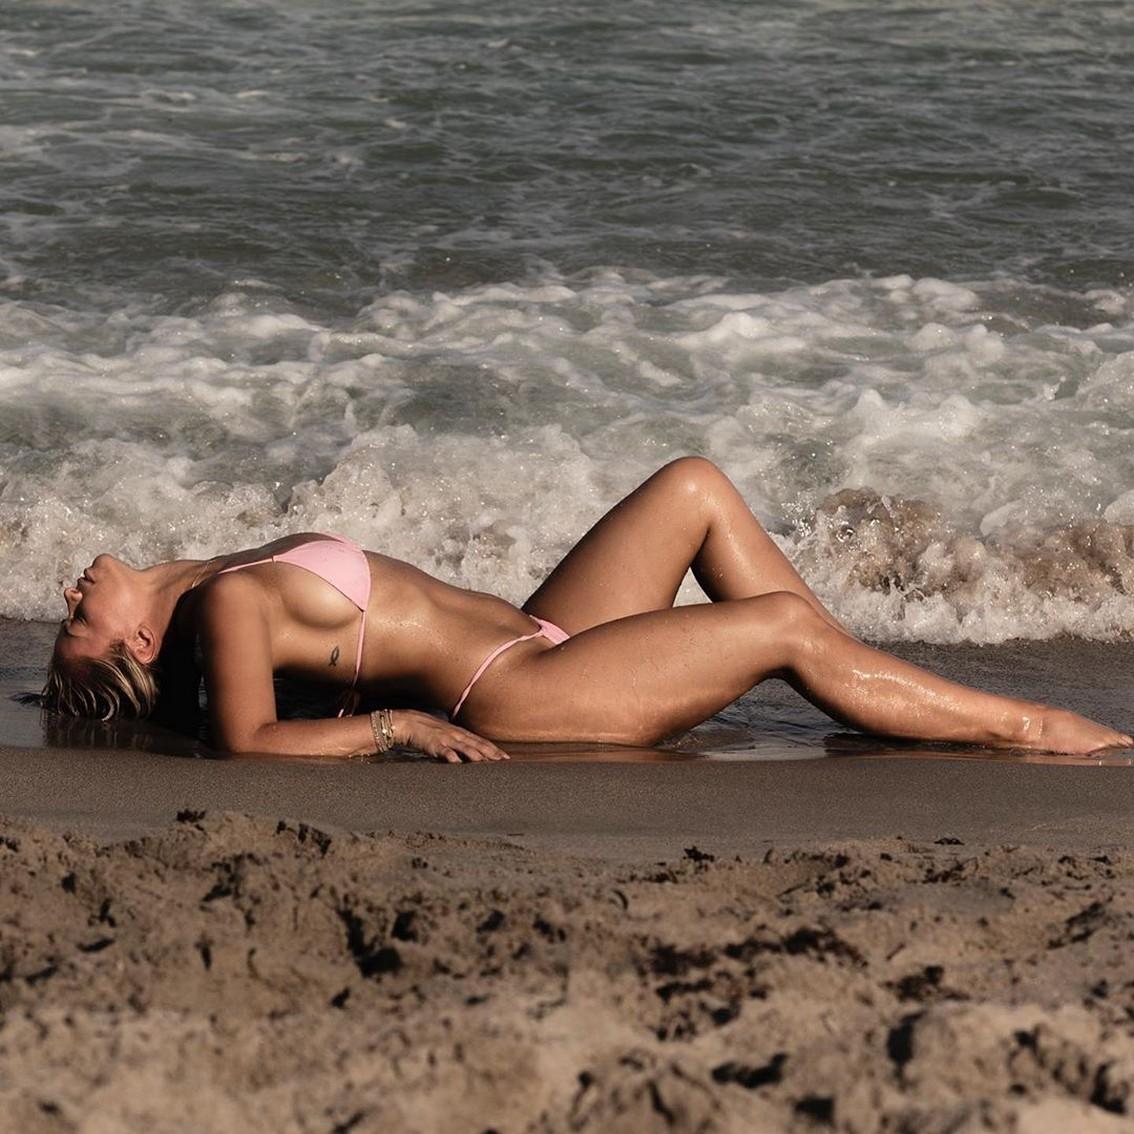 Paige VanZant on beach sex pics